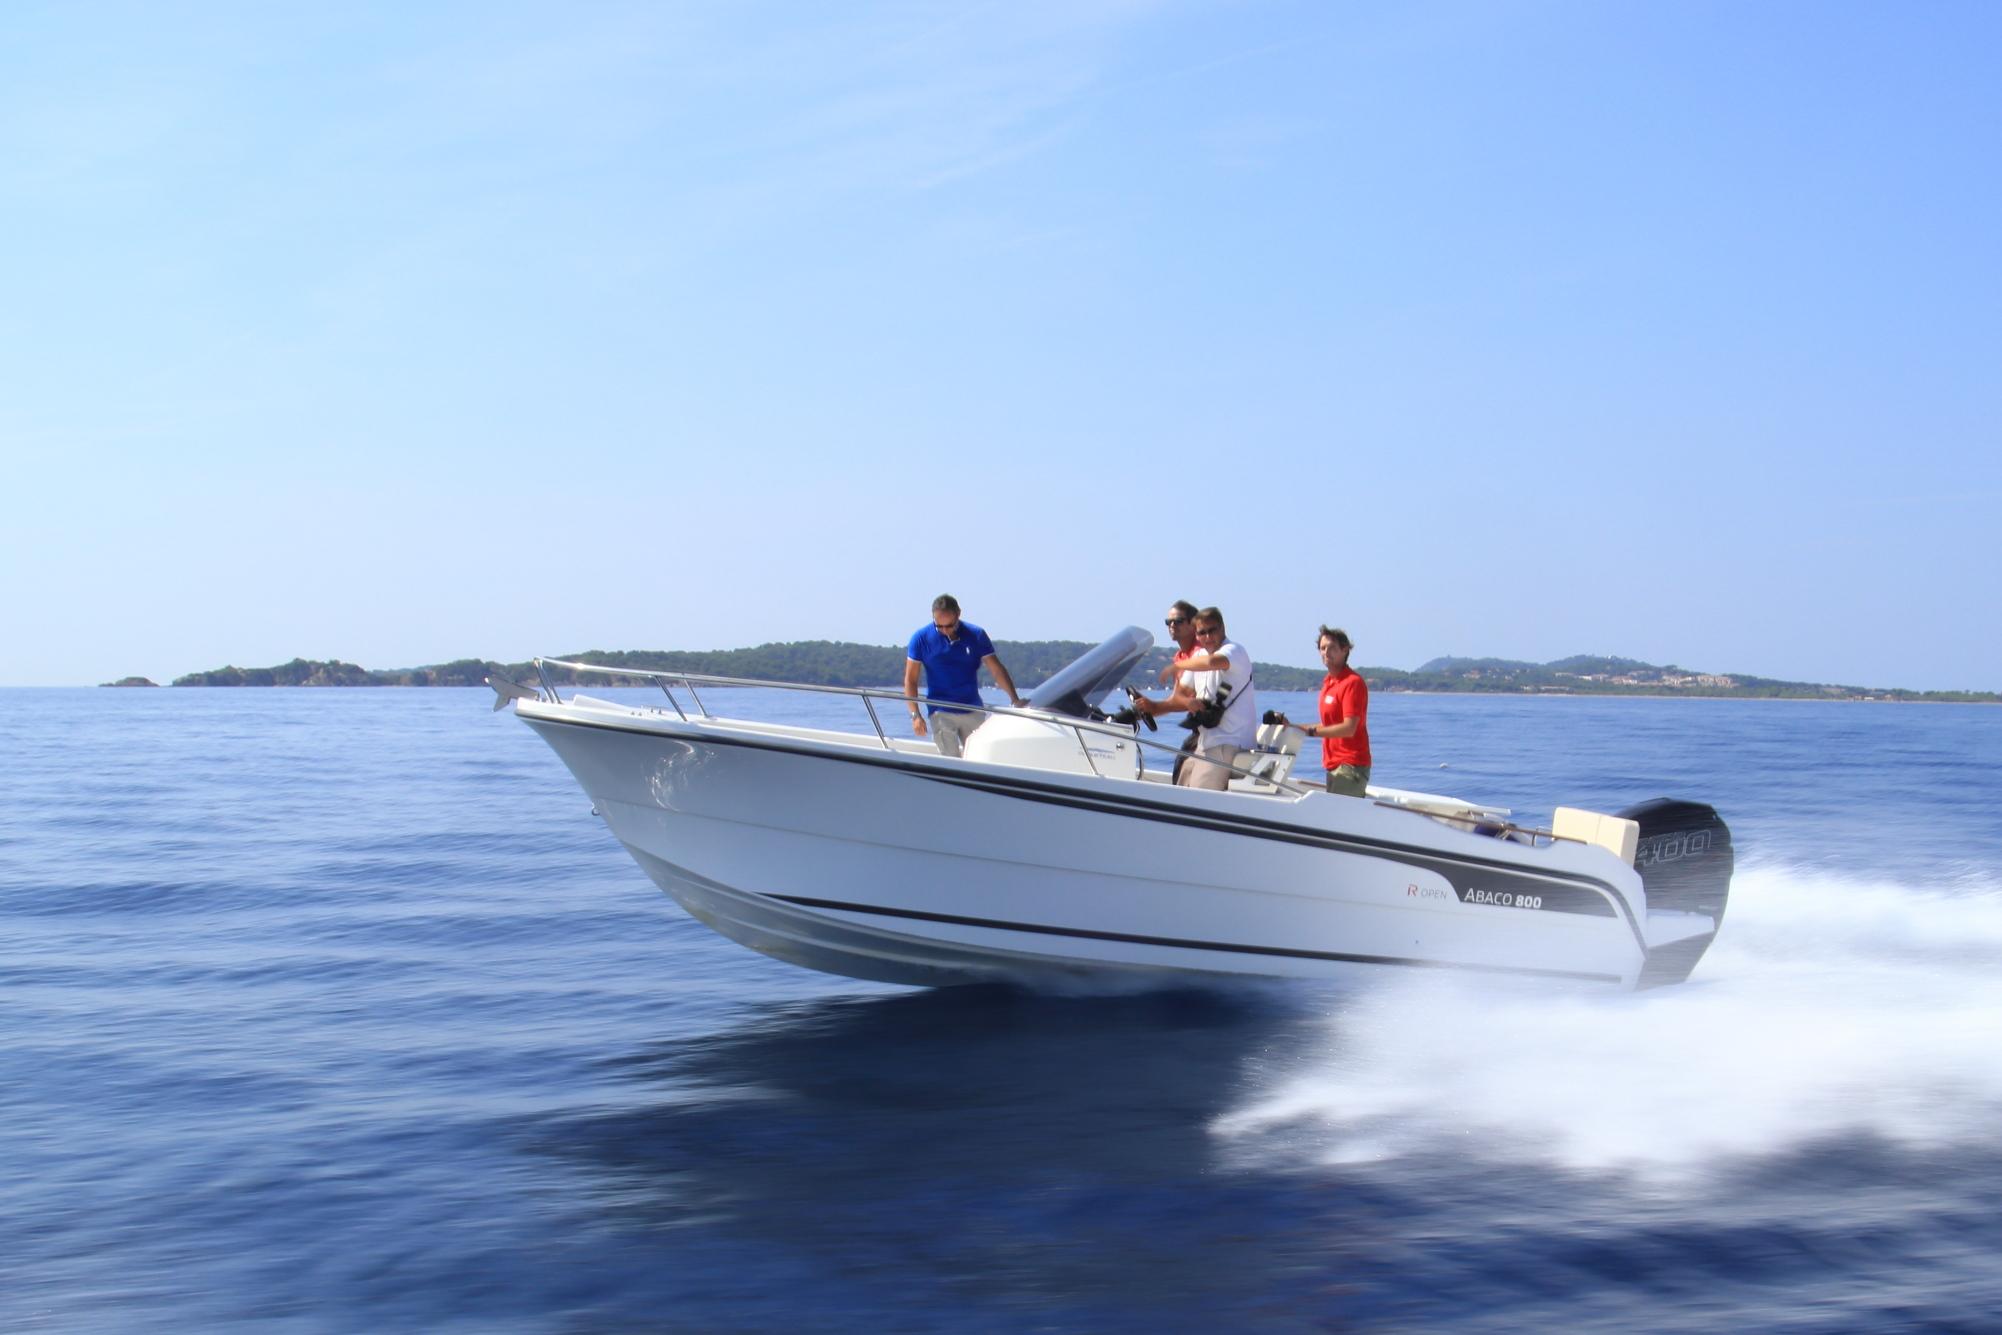 bateau  u00e0 moteur ocqueteau abaco 800 hors-bord